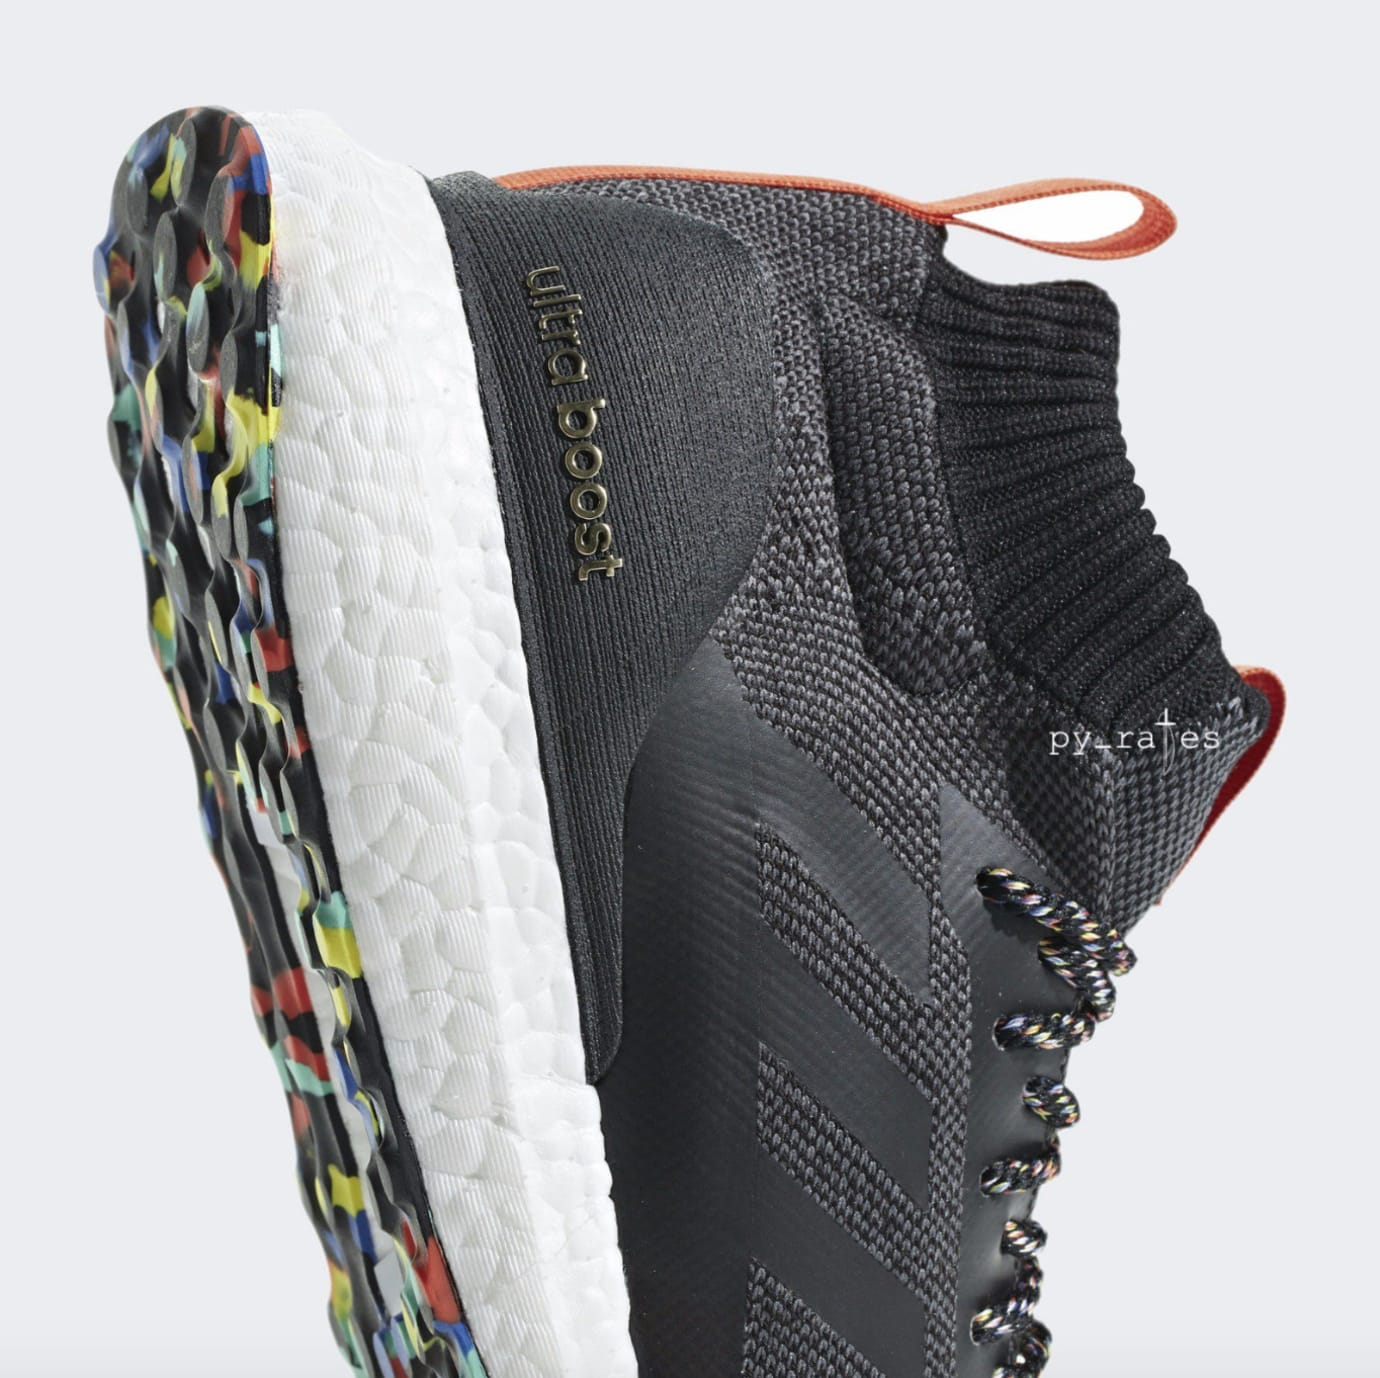 Adidas Ultra Boost Mid 'Black/Multicolor' (Detail)